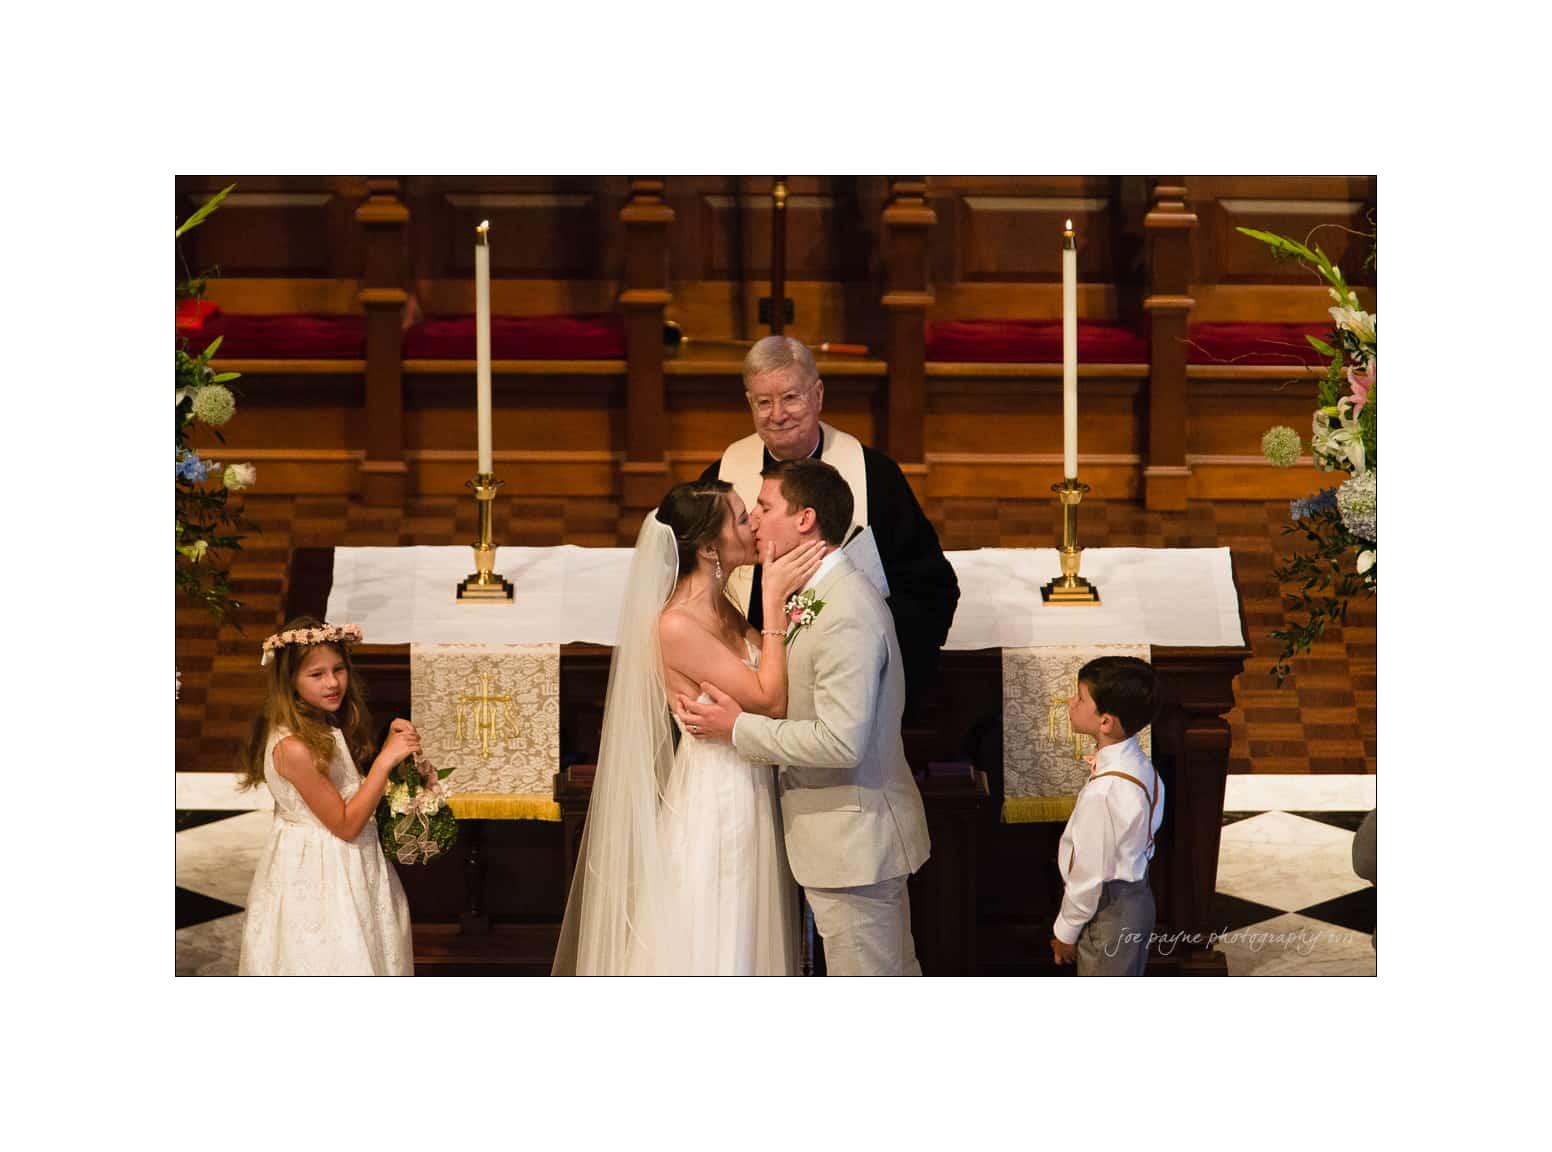 nc wedding photographer first kiss